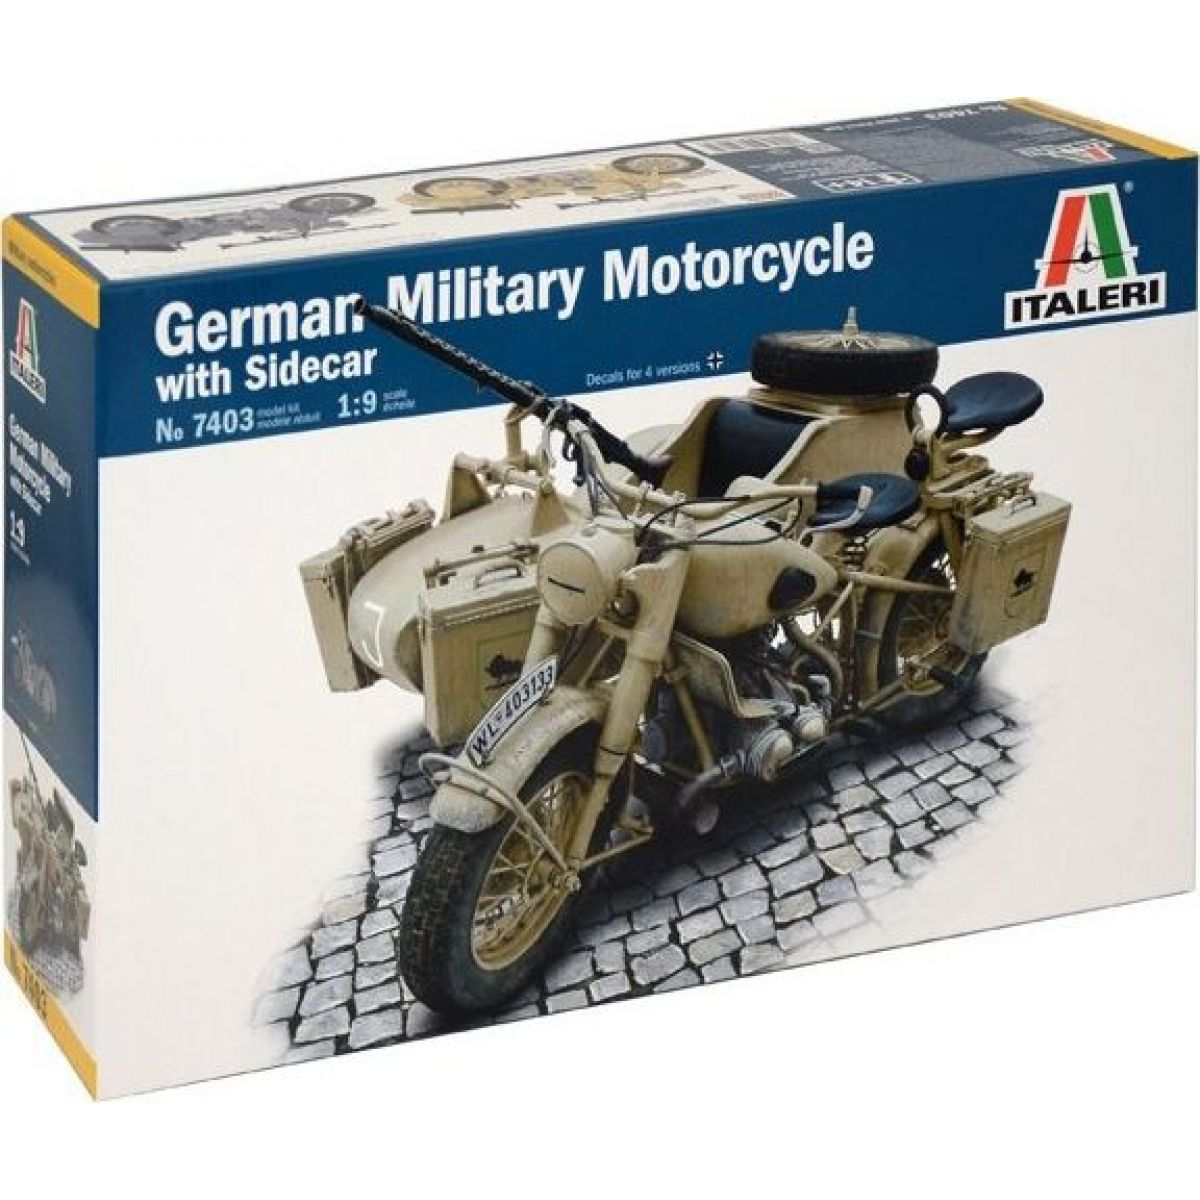 Italeri Model Kit military 7403 German Military Motorcycle with Sidecar 1: 9